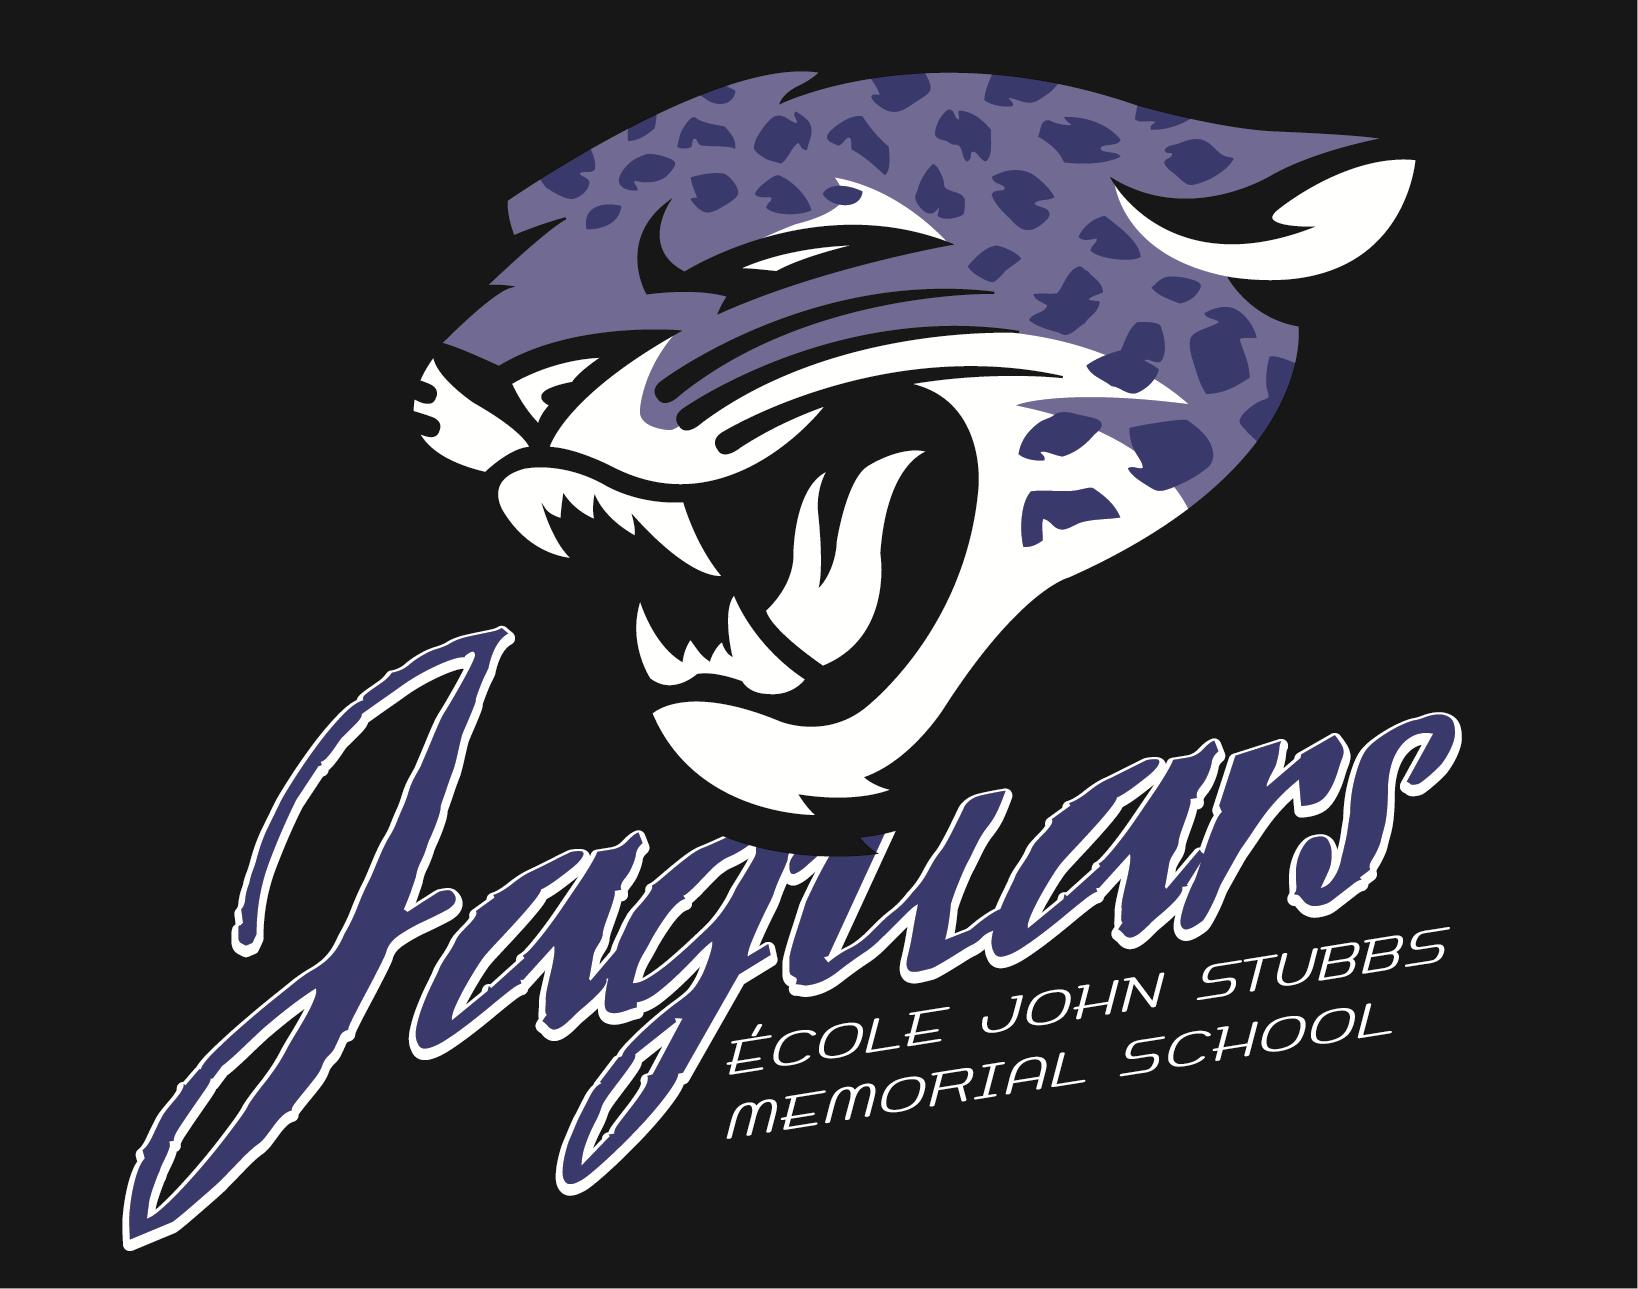 École John Stubbs Memorial